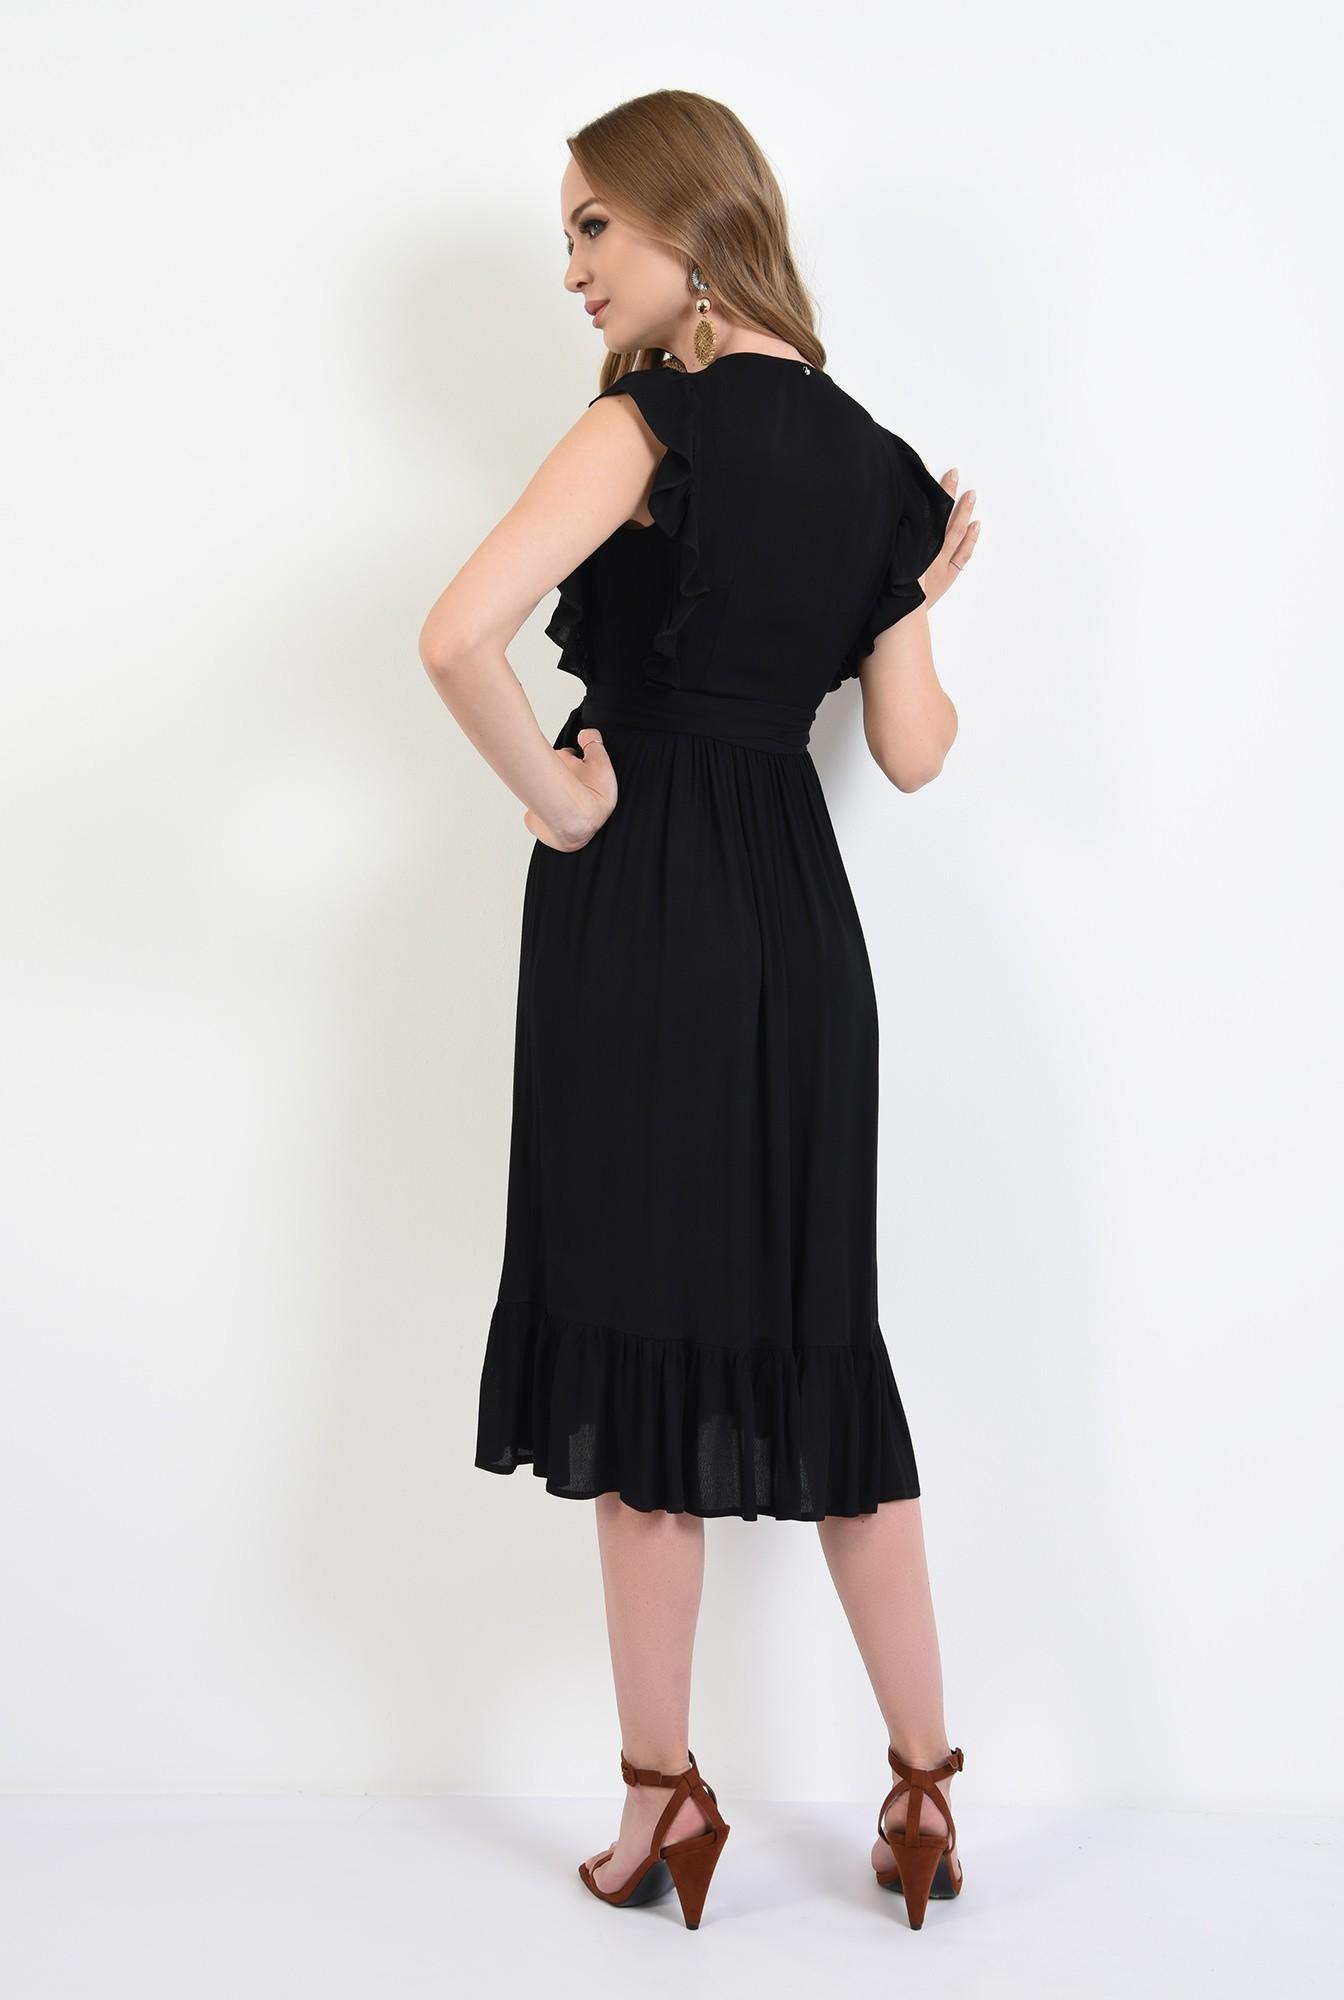 1 - 360 - rochie neagra, petrecuta, cu volan la umeri, Poema